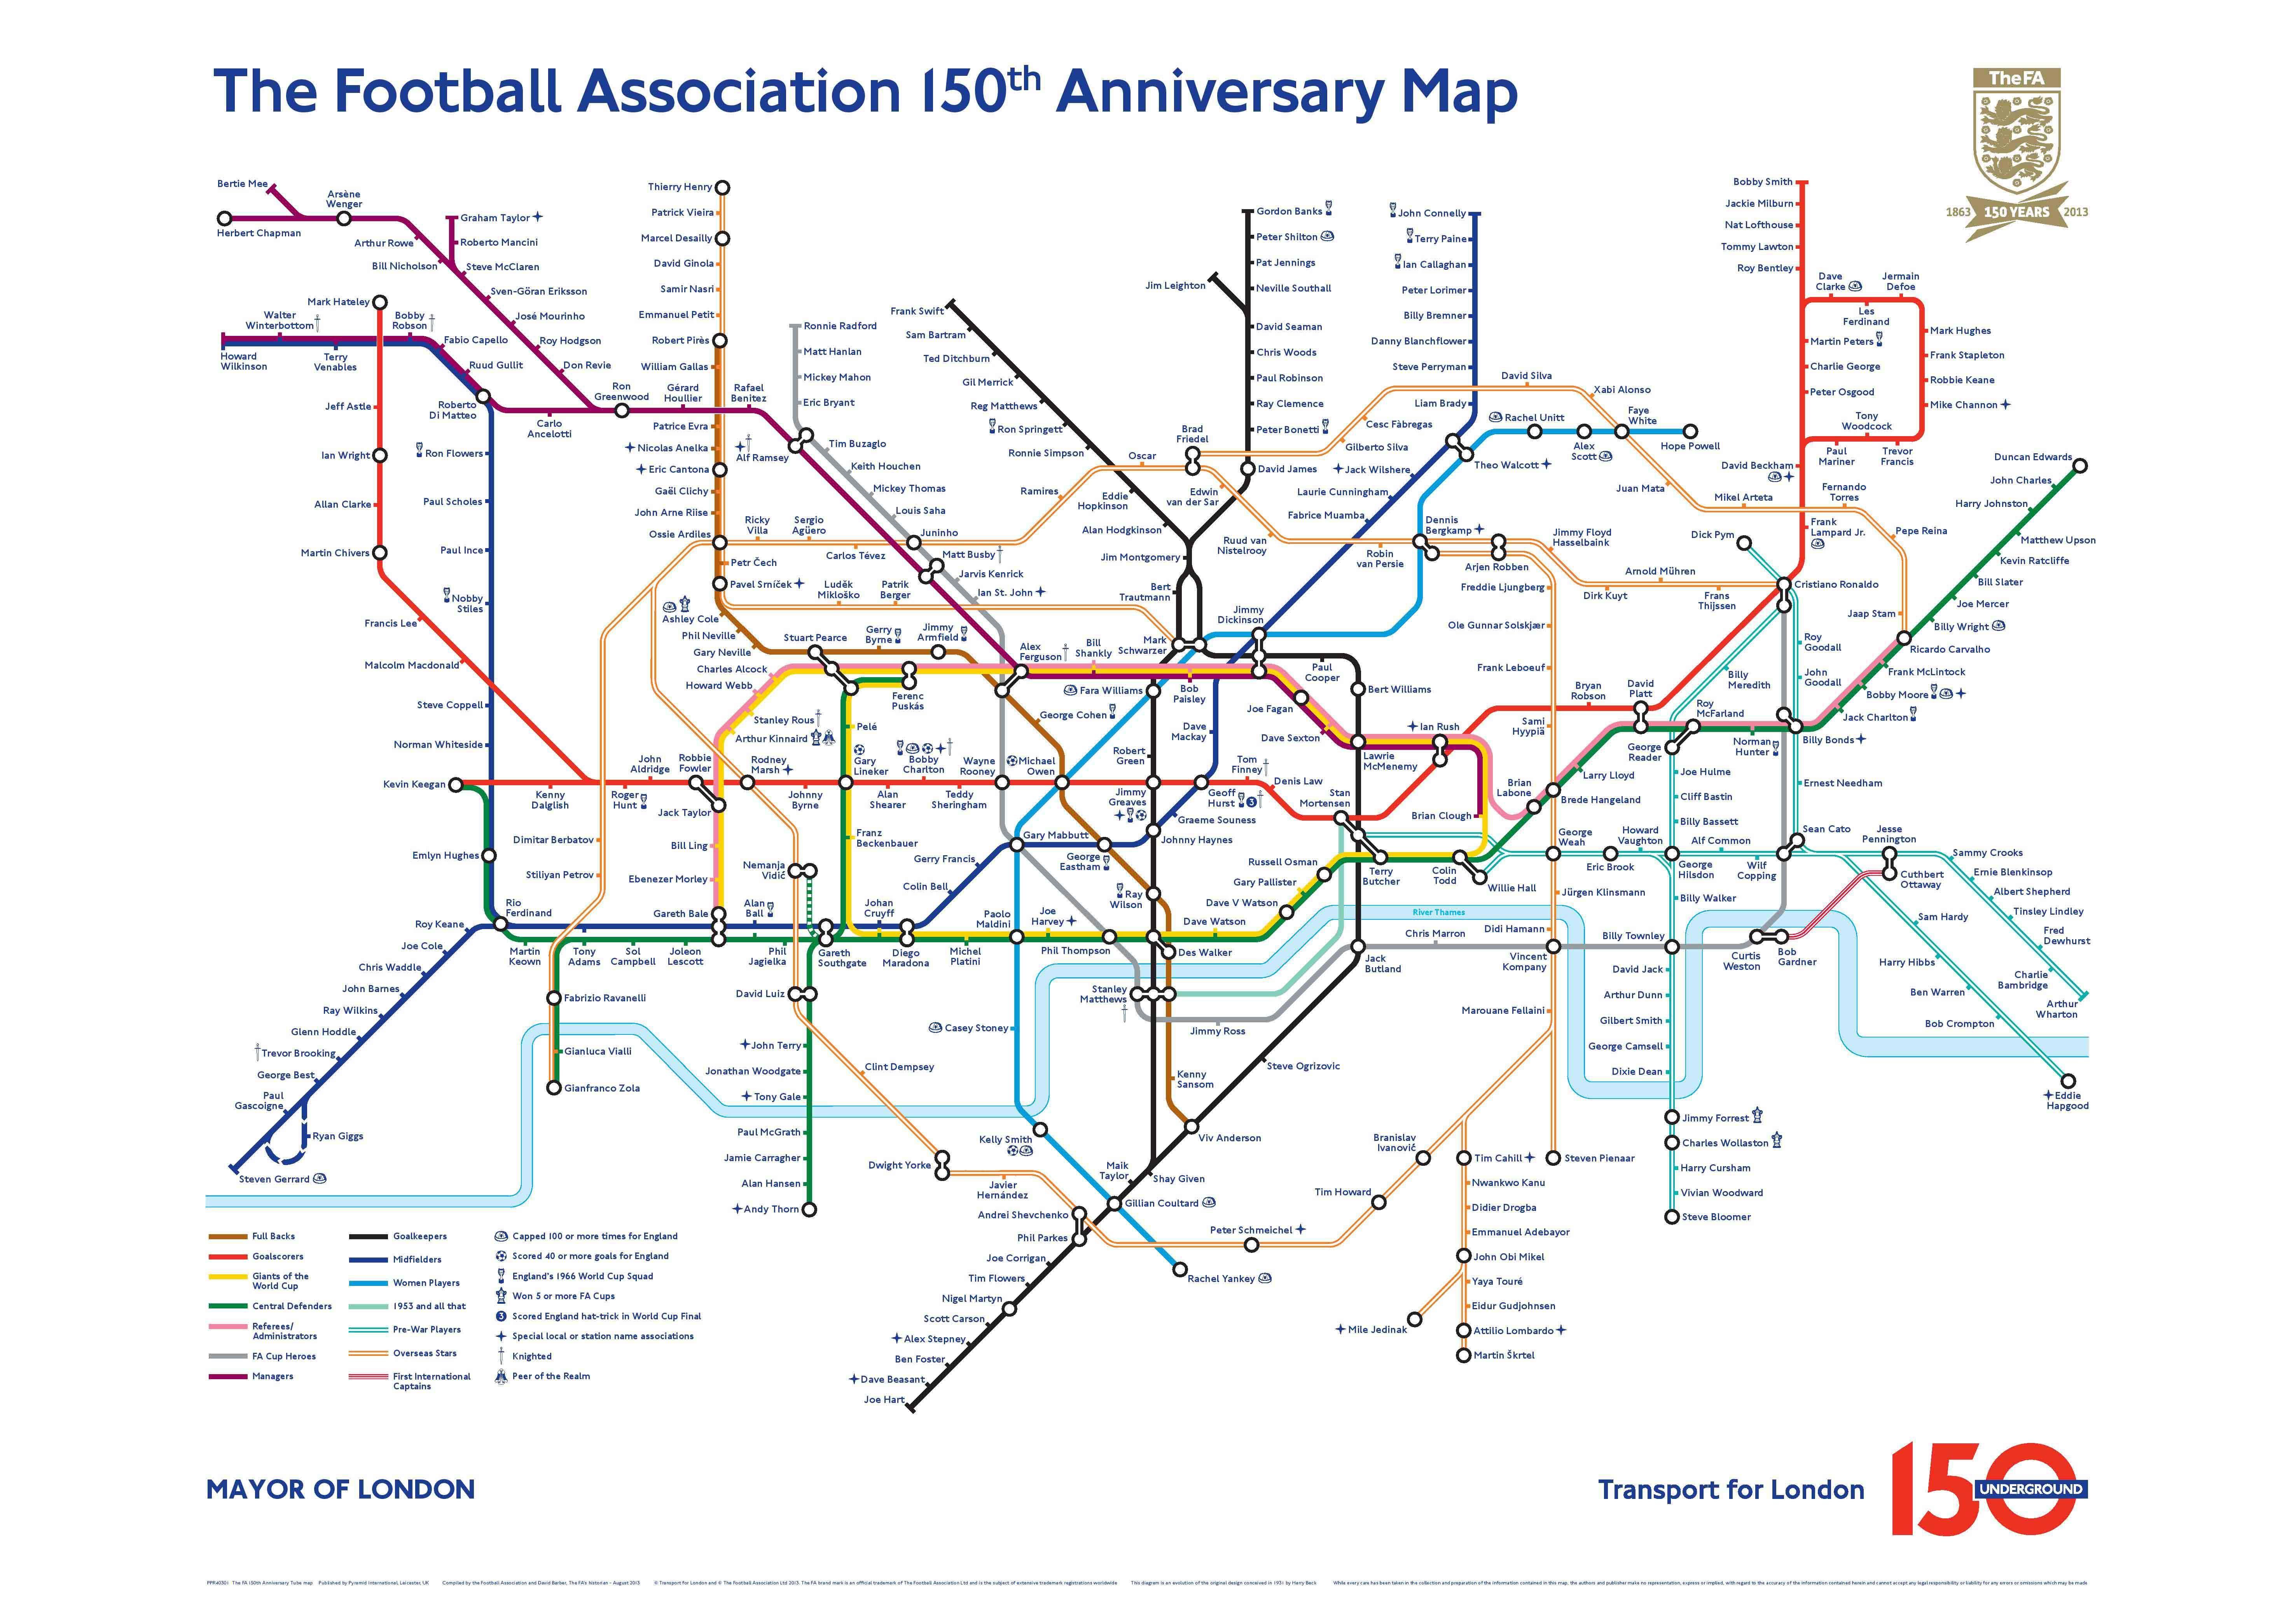 London Tube Map The Football Association 150th Anniversary Map – London Subway System Map